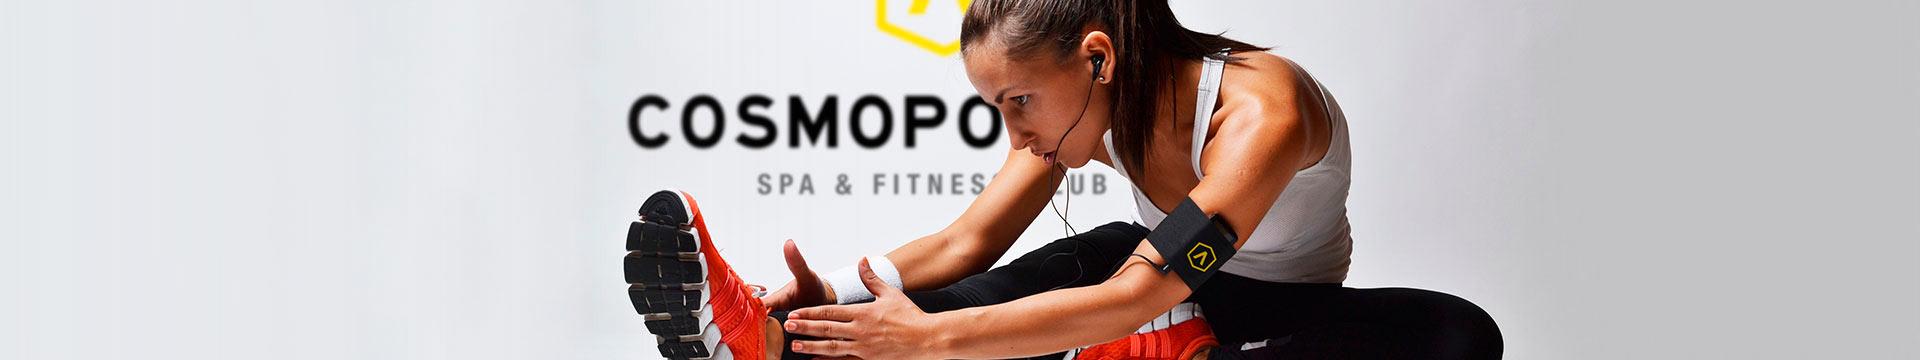 Gimnasio Alicante - fitness